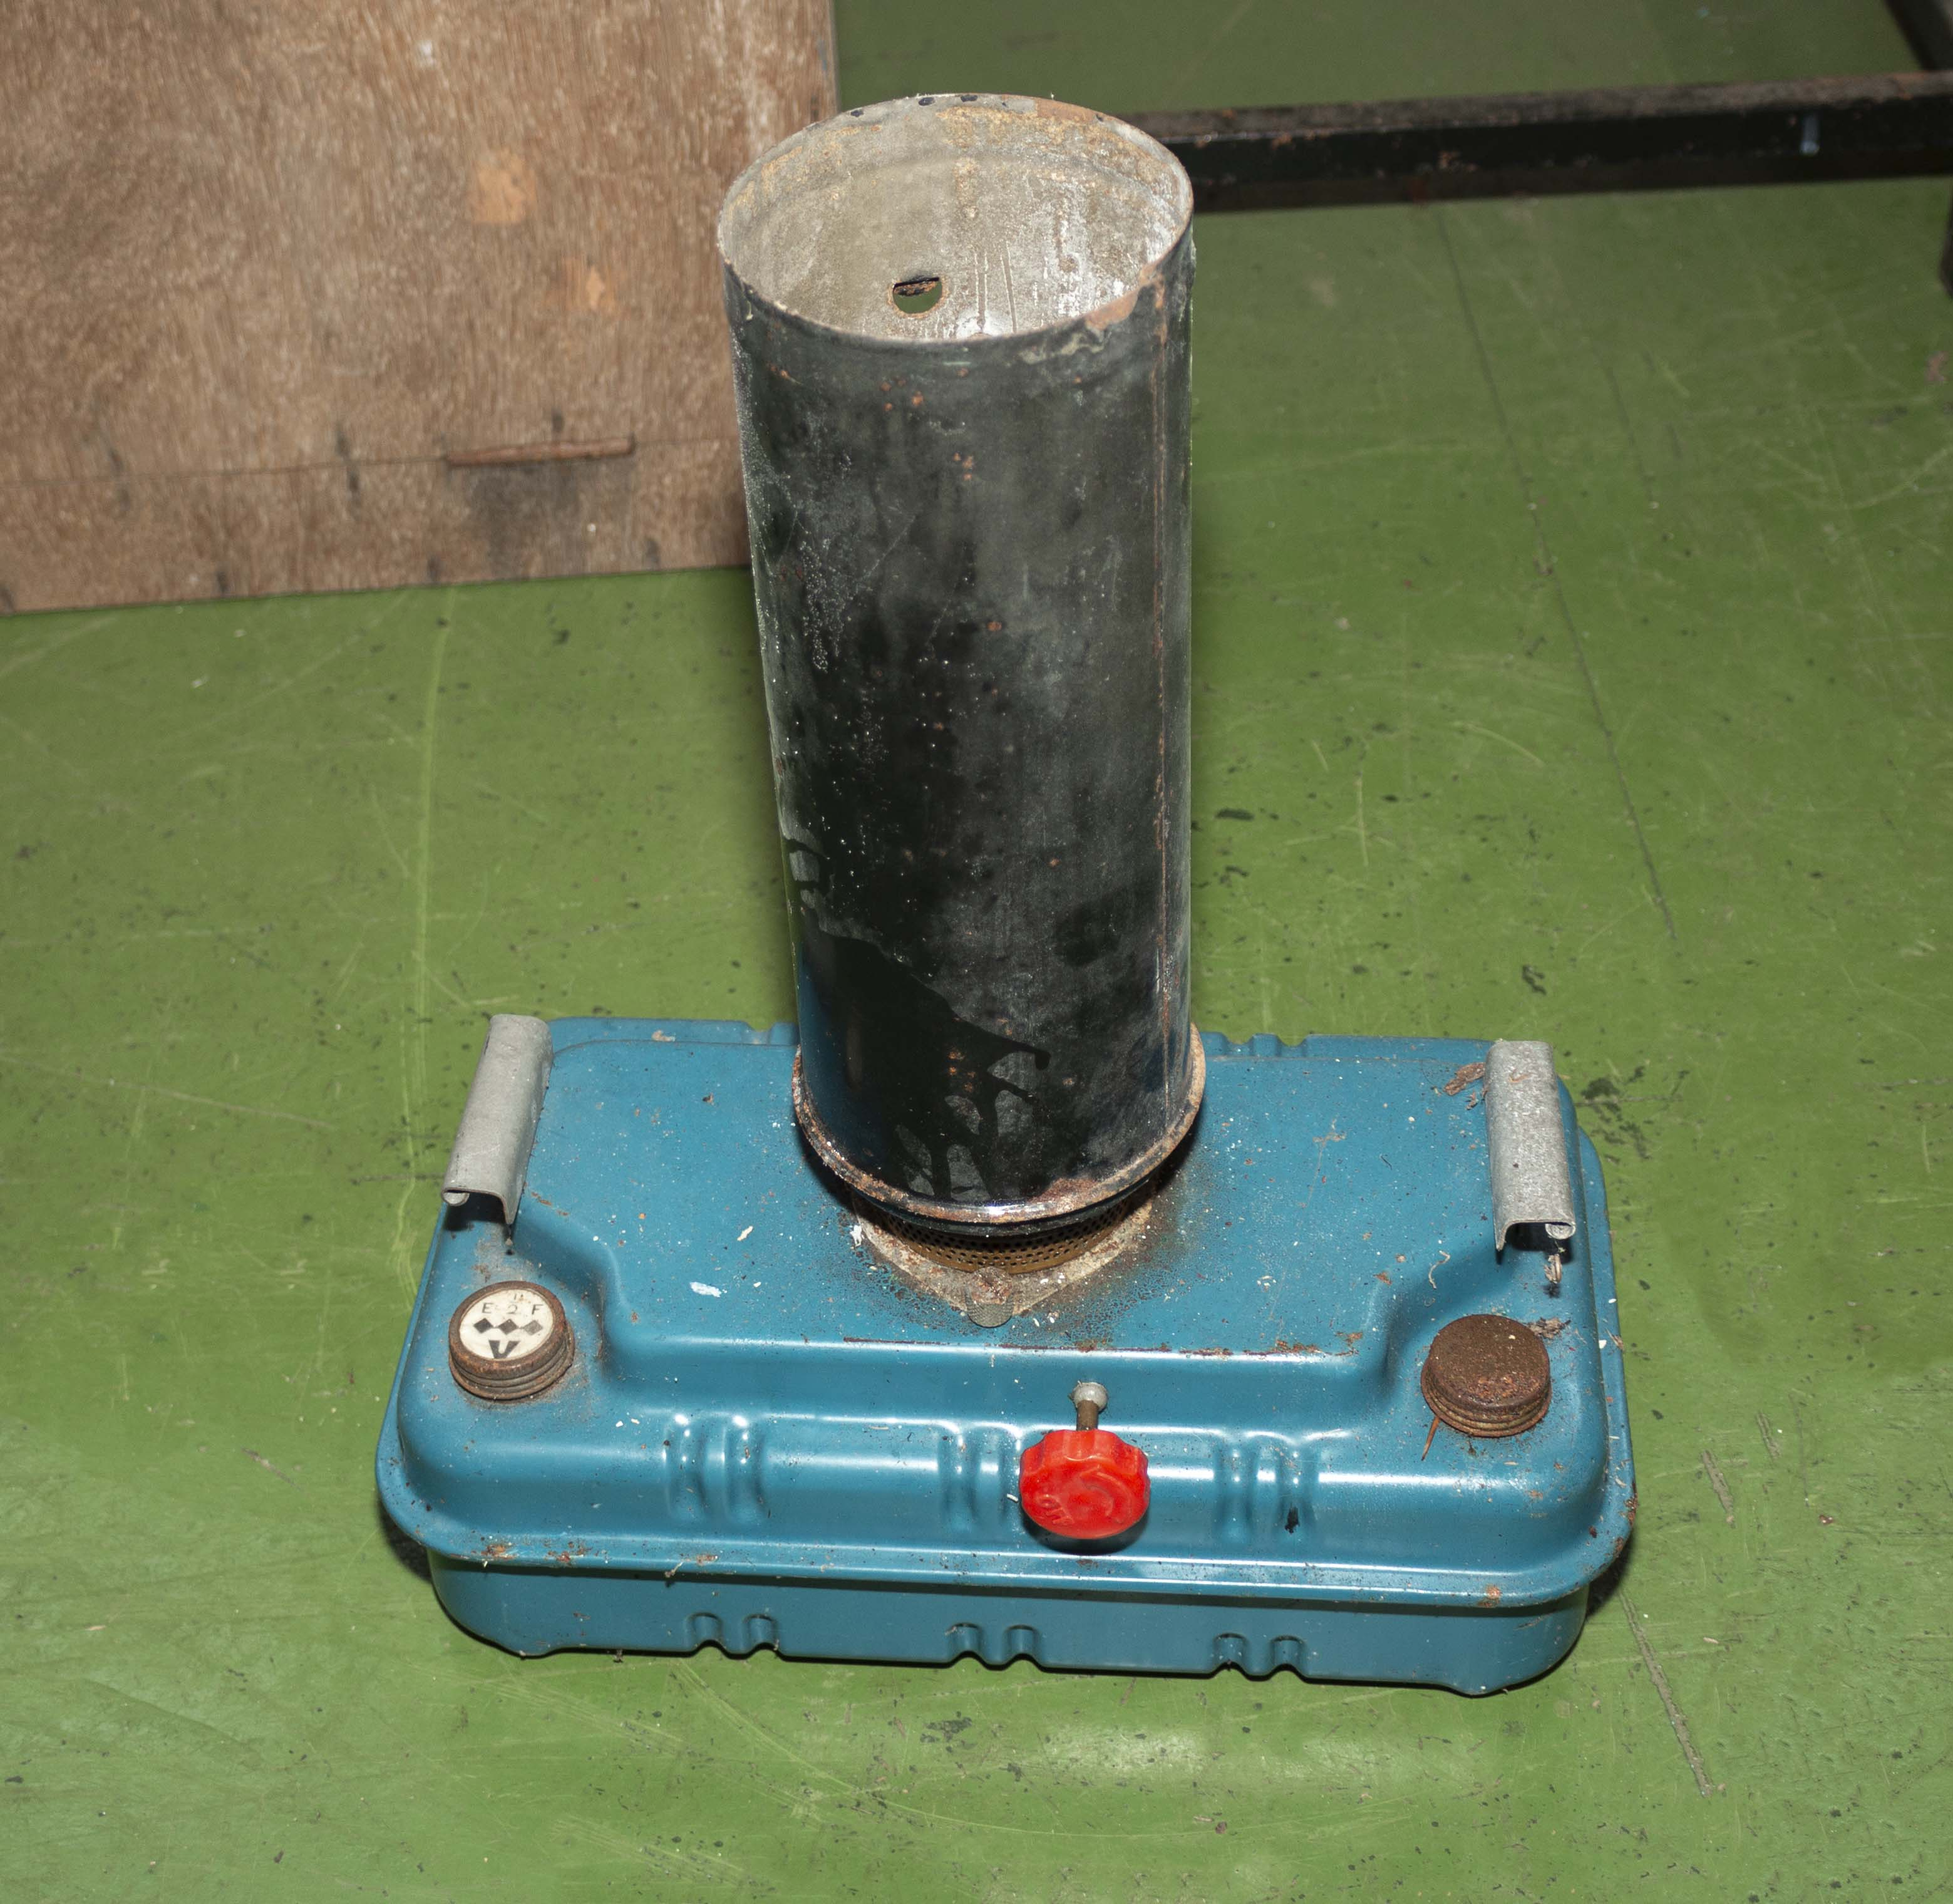 A Paraffin greenhouse heater